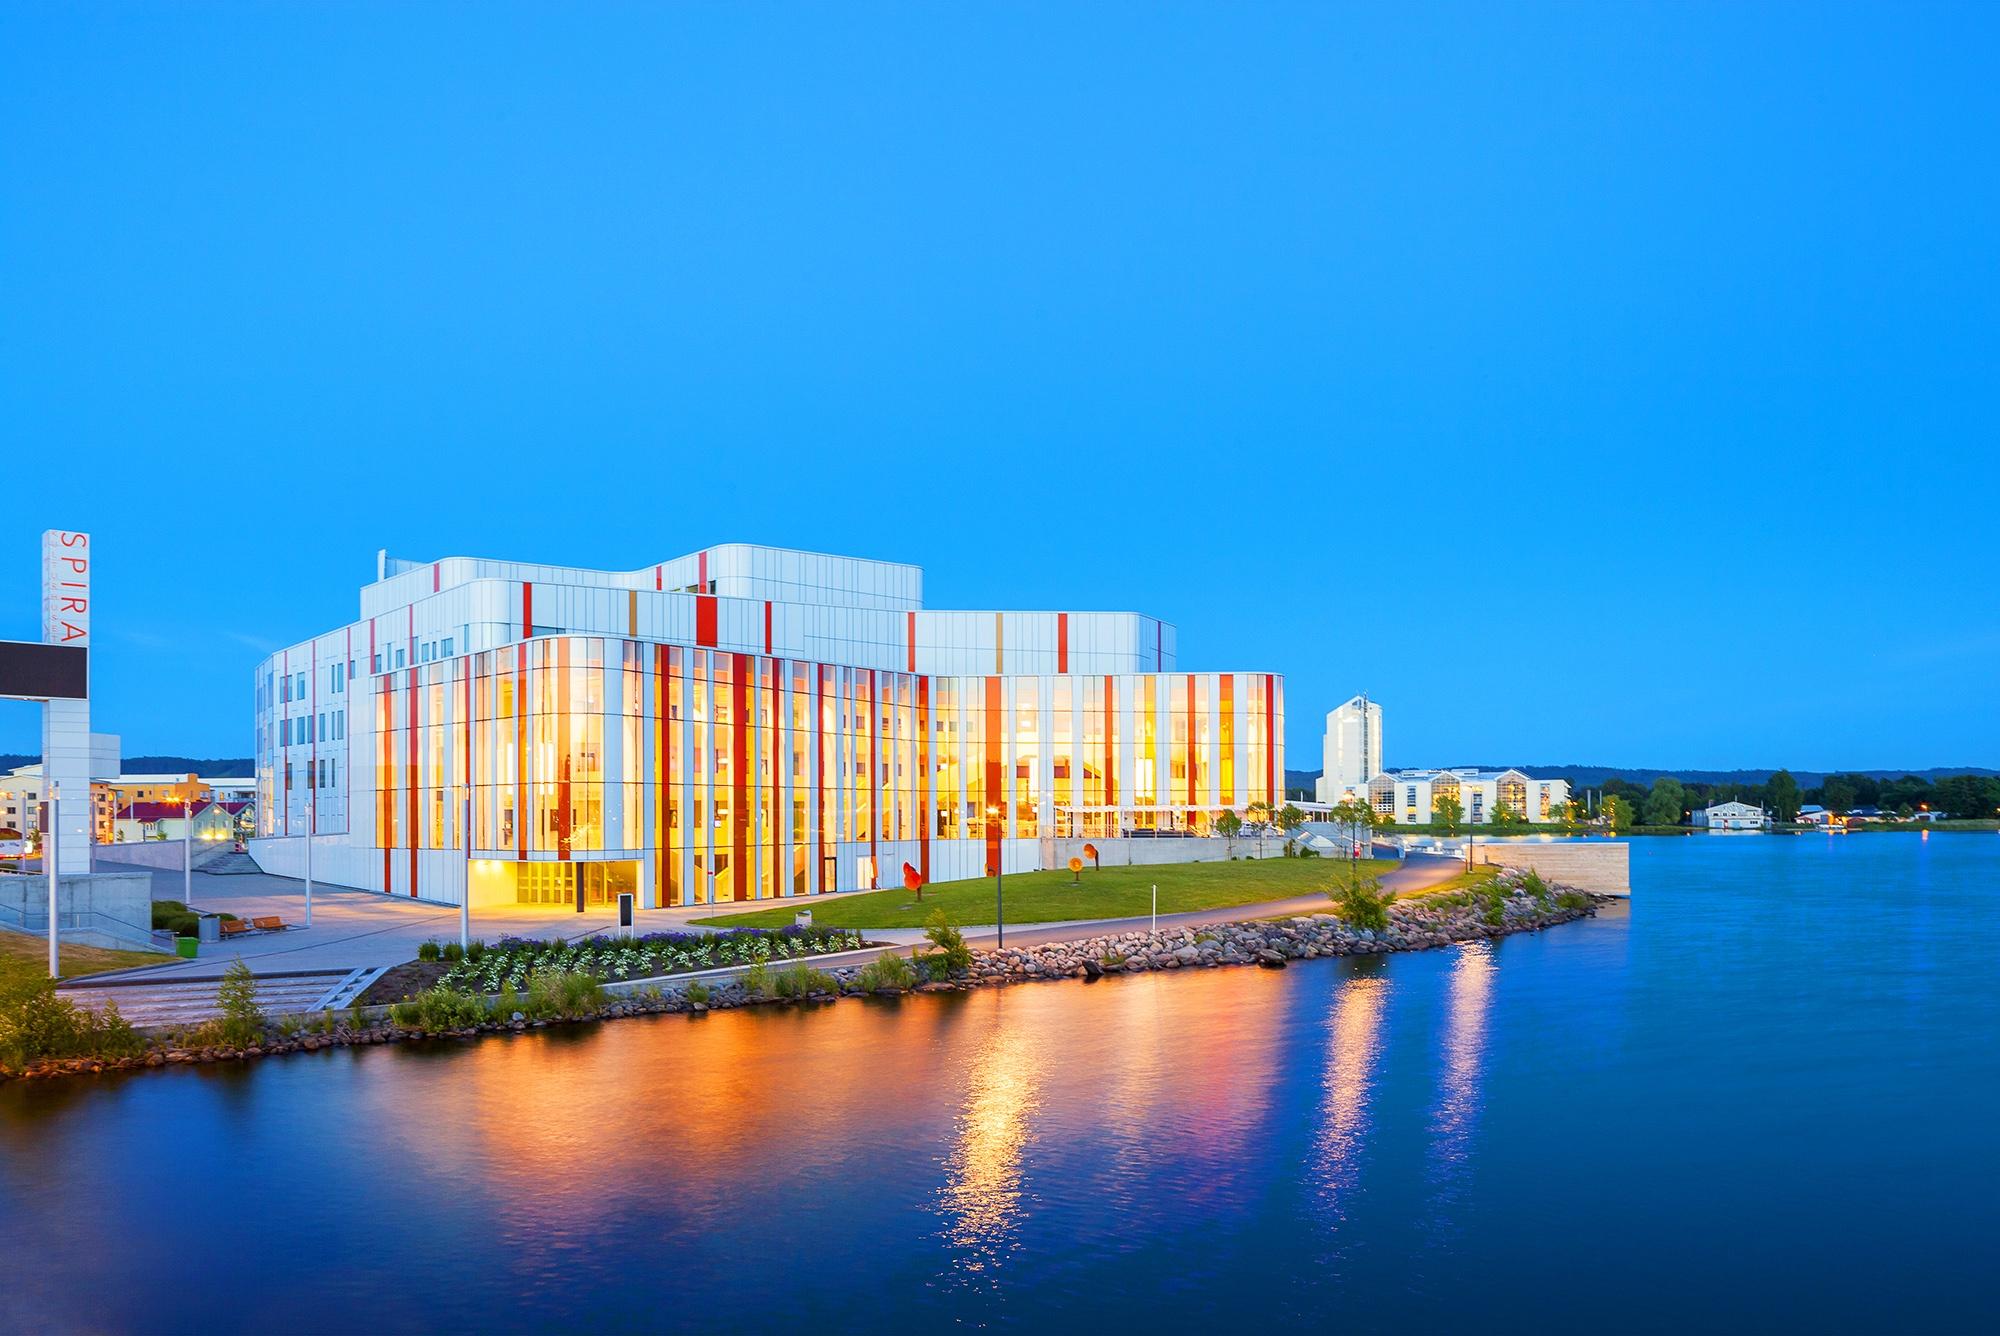 Kulturhuset Spira Upgrades System with L-Acoustics K Series featured image